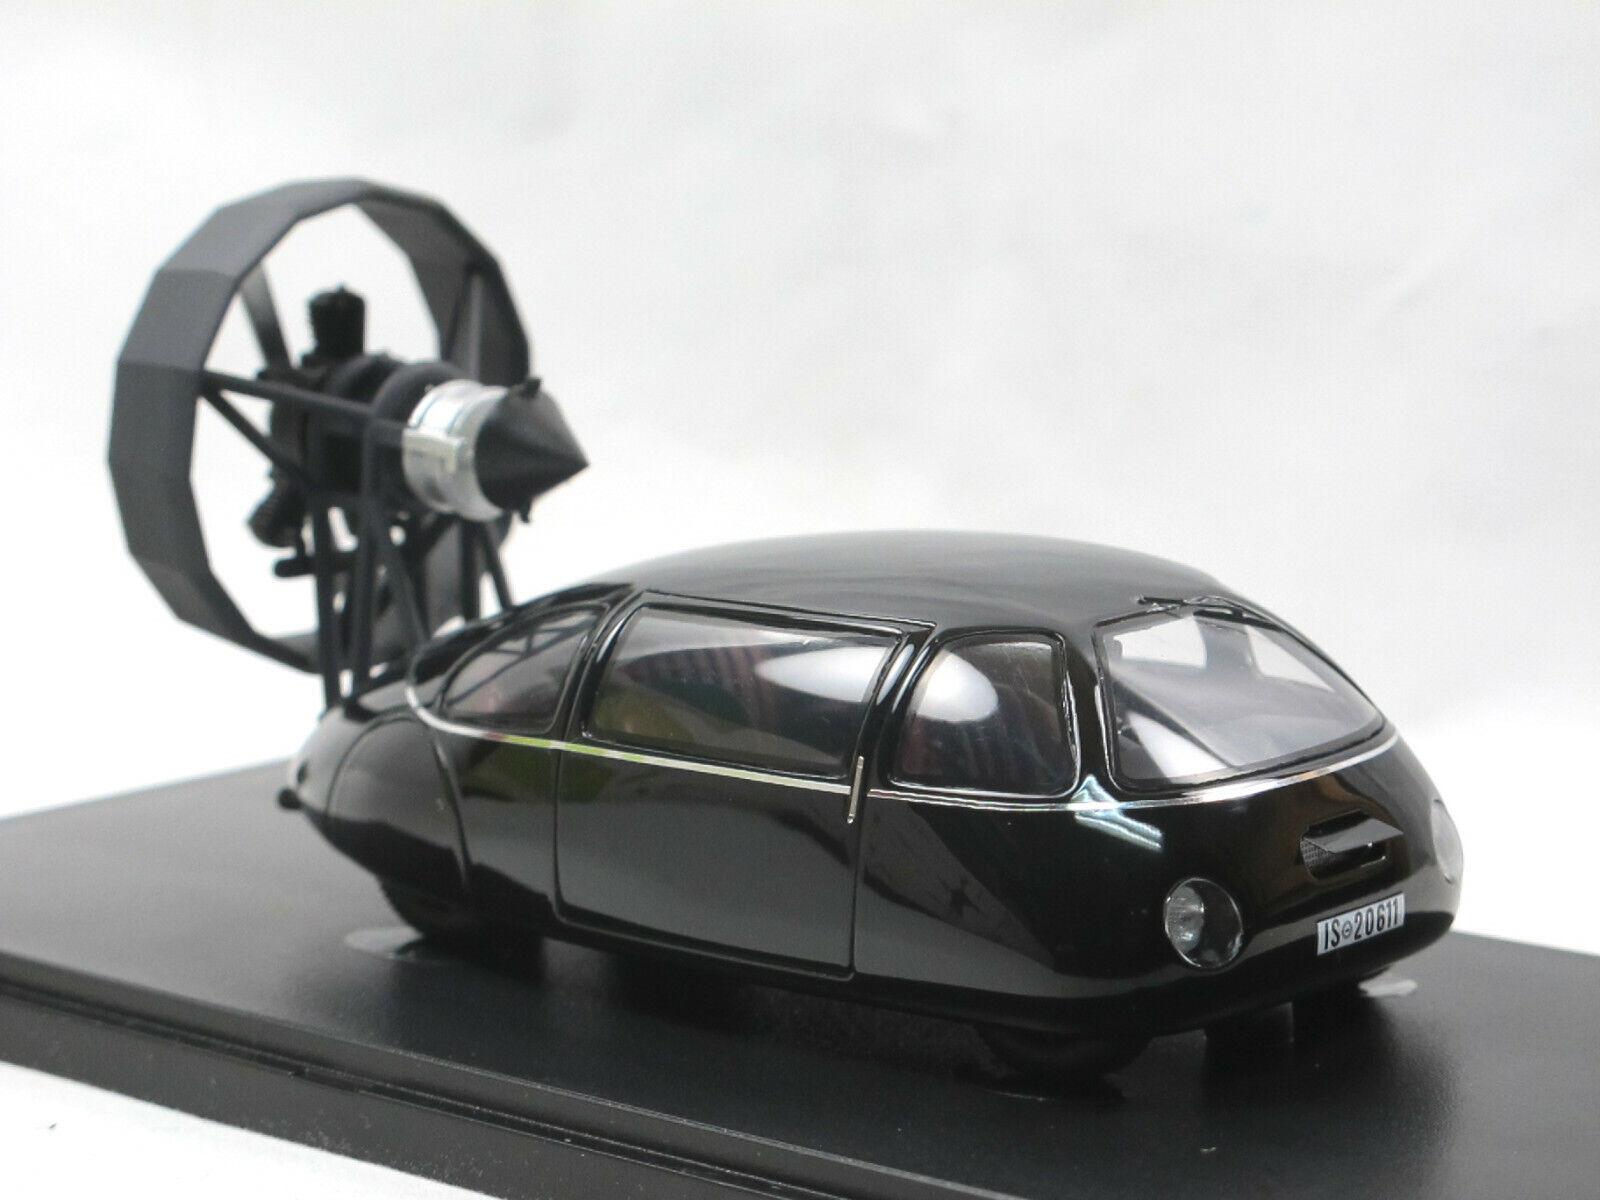 Autocult 04020 - 1942 schlörwagen Göttingen œuf avec turbine MERCEDES MERCEDES MERCEDES 170 H 1 43 87b93d